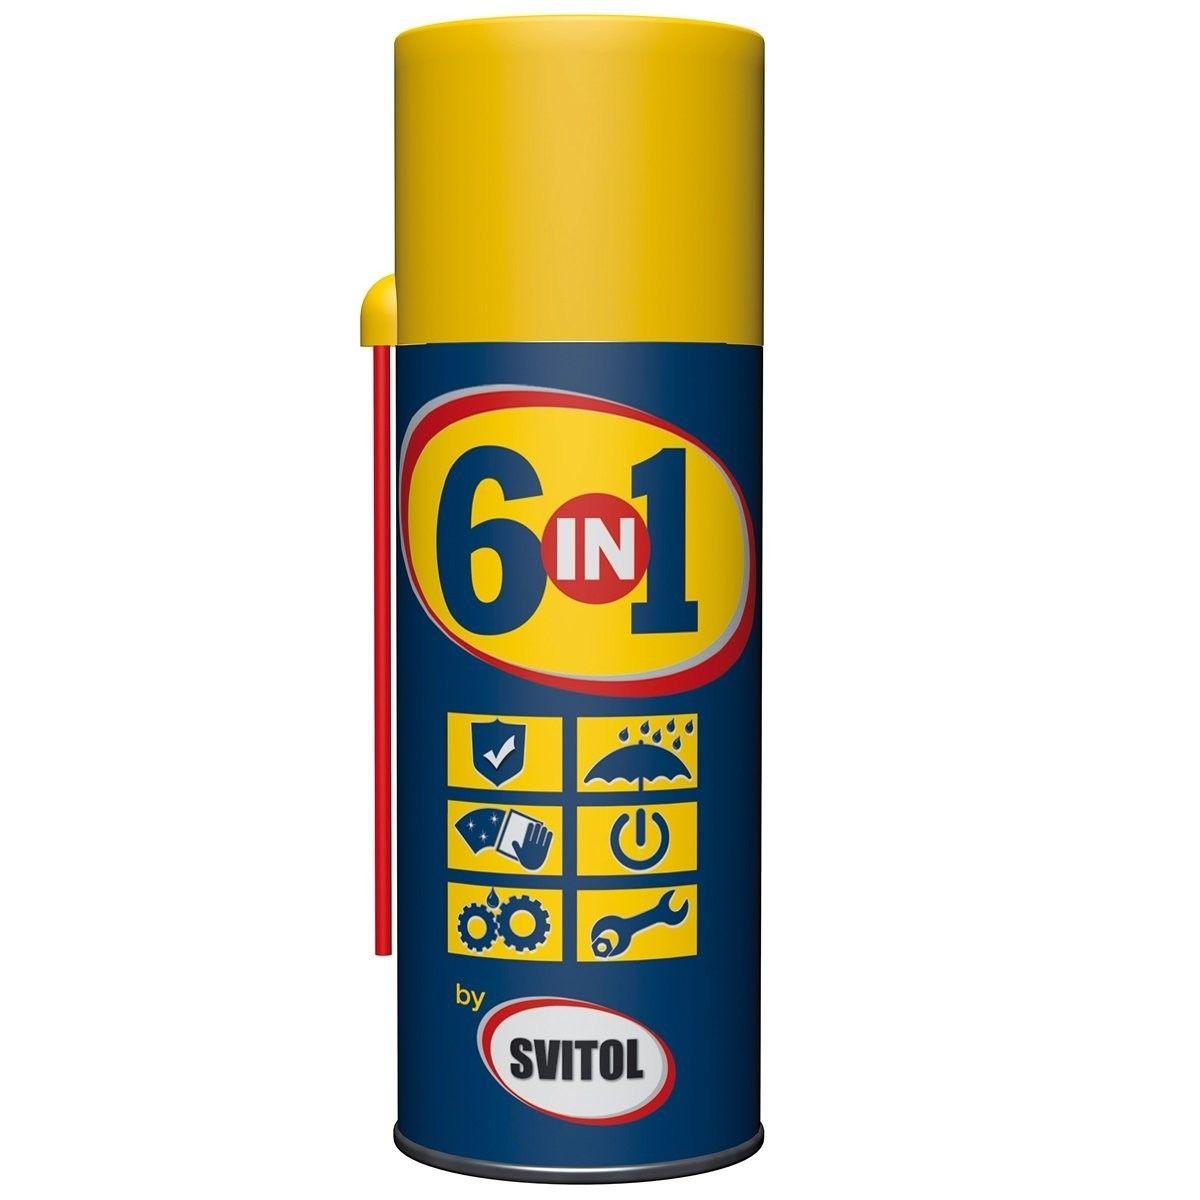 Sbloccante Spray 'Svitol 6 In 1' ml 400 AREXONS